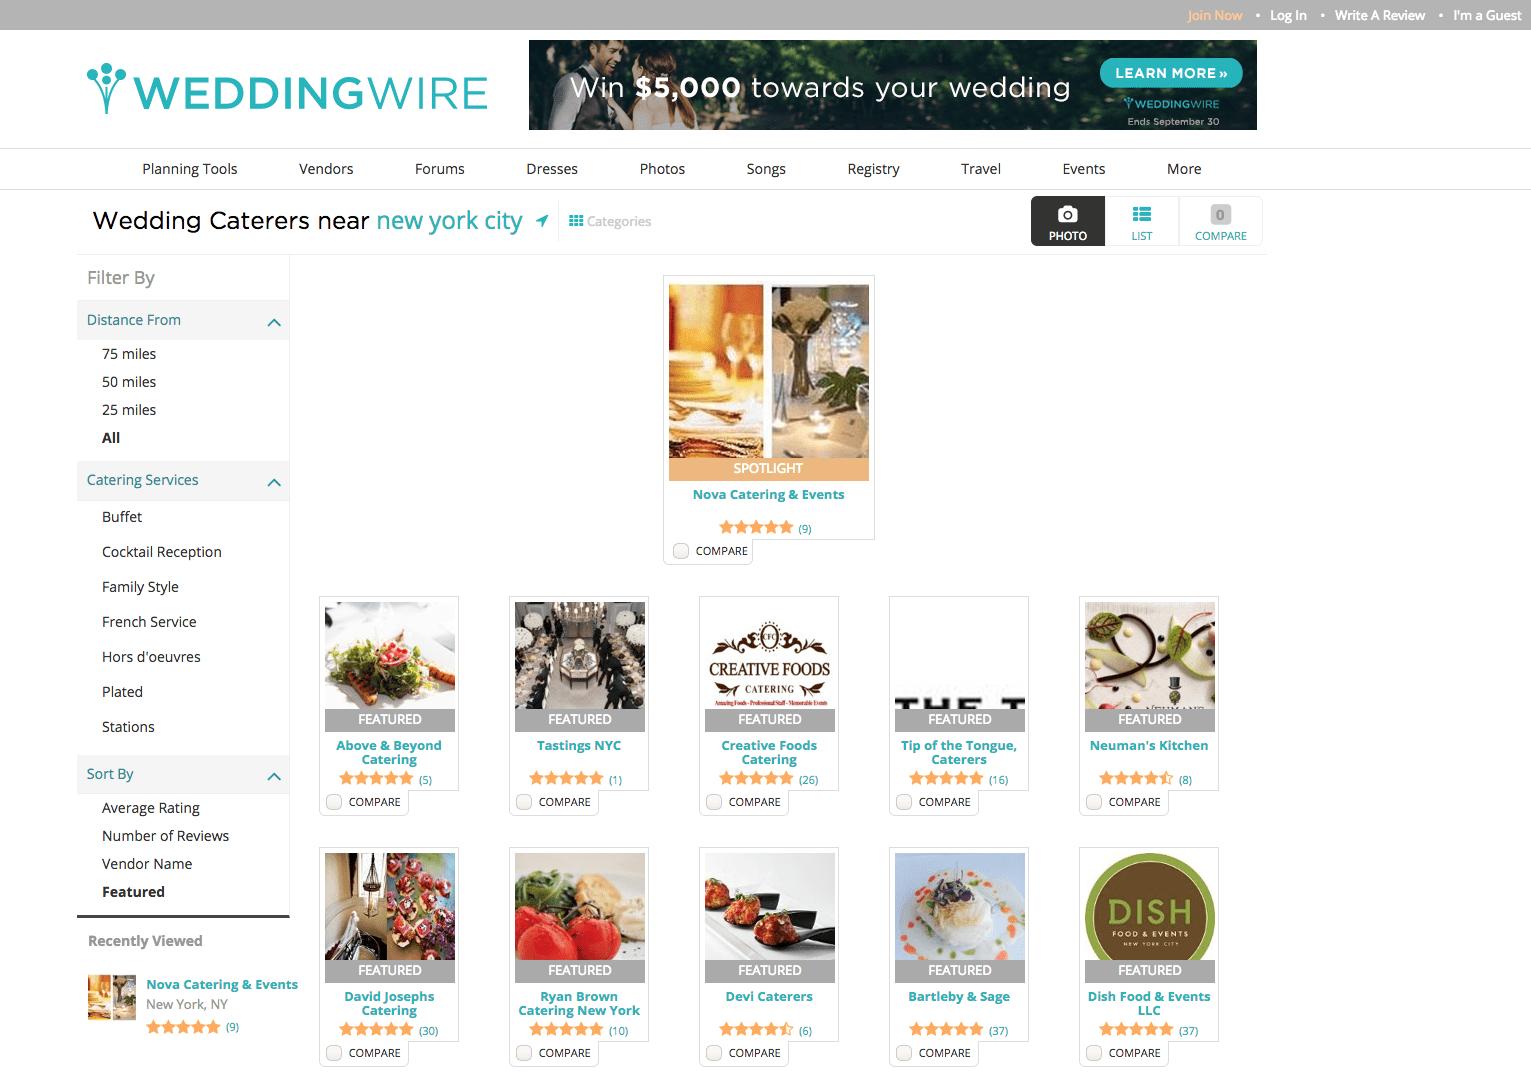 Wedding Wire Spotlight Catering Vendor